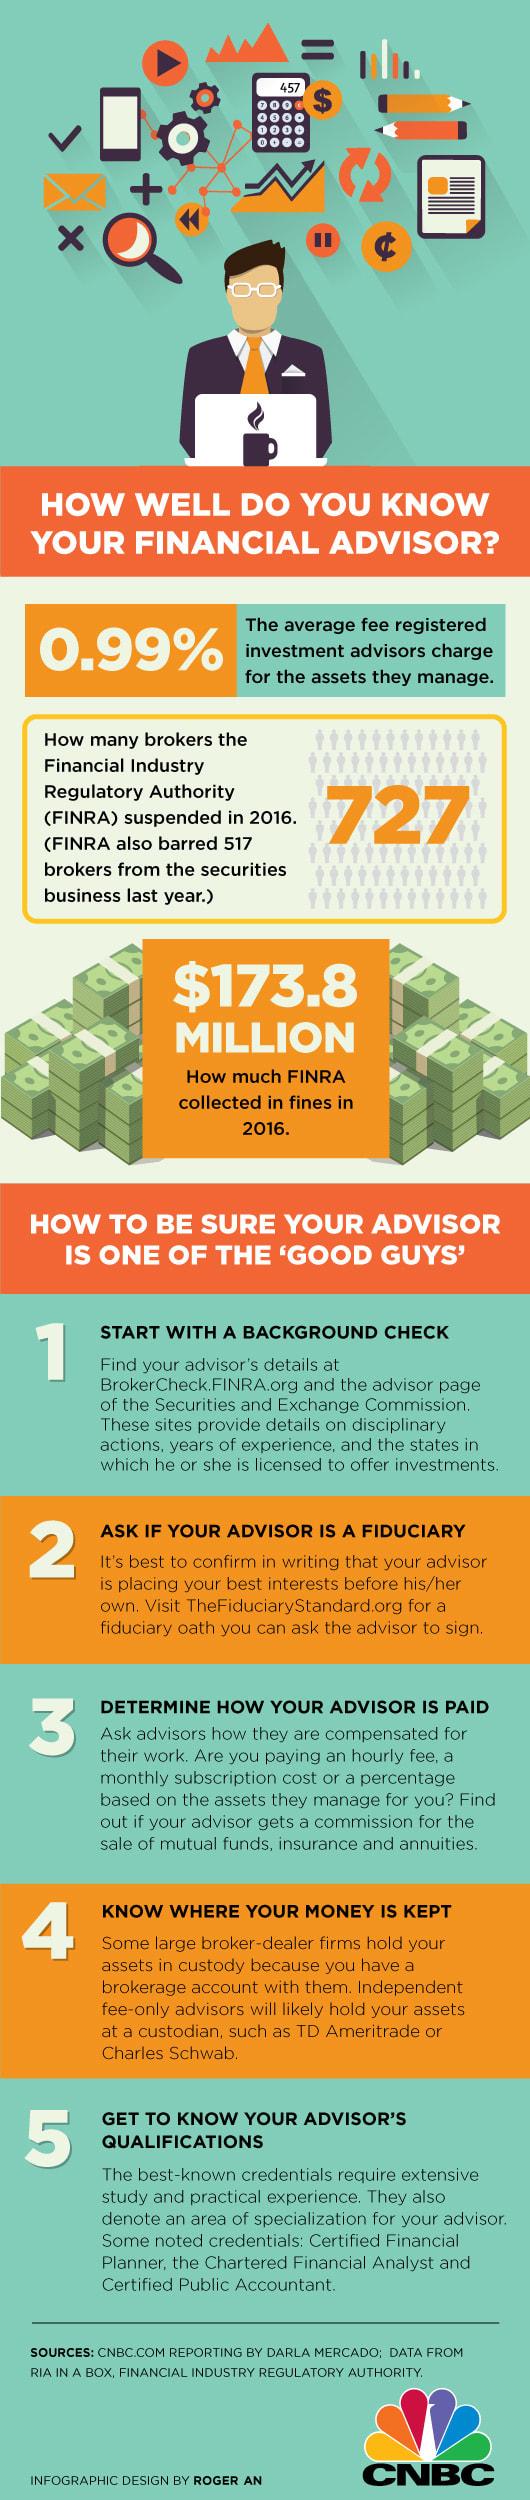 Vetting a financial advisor infographic